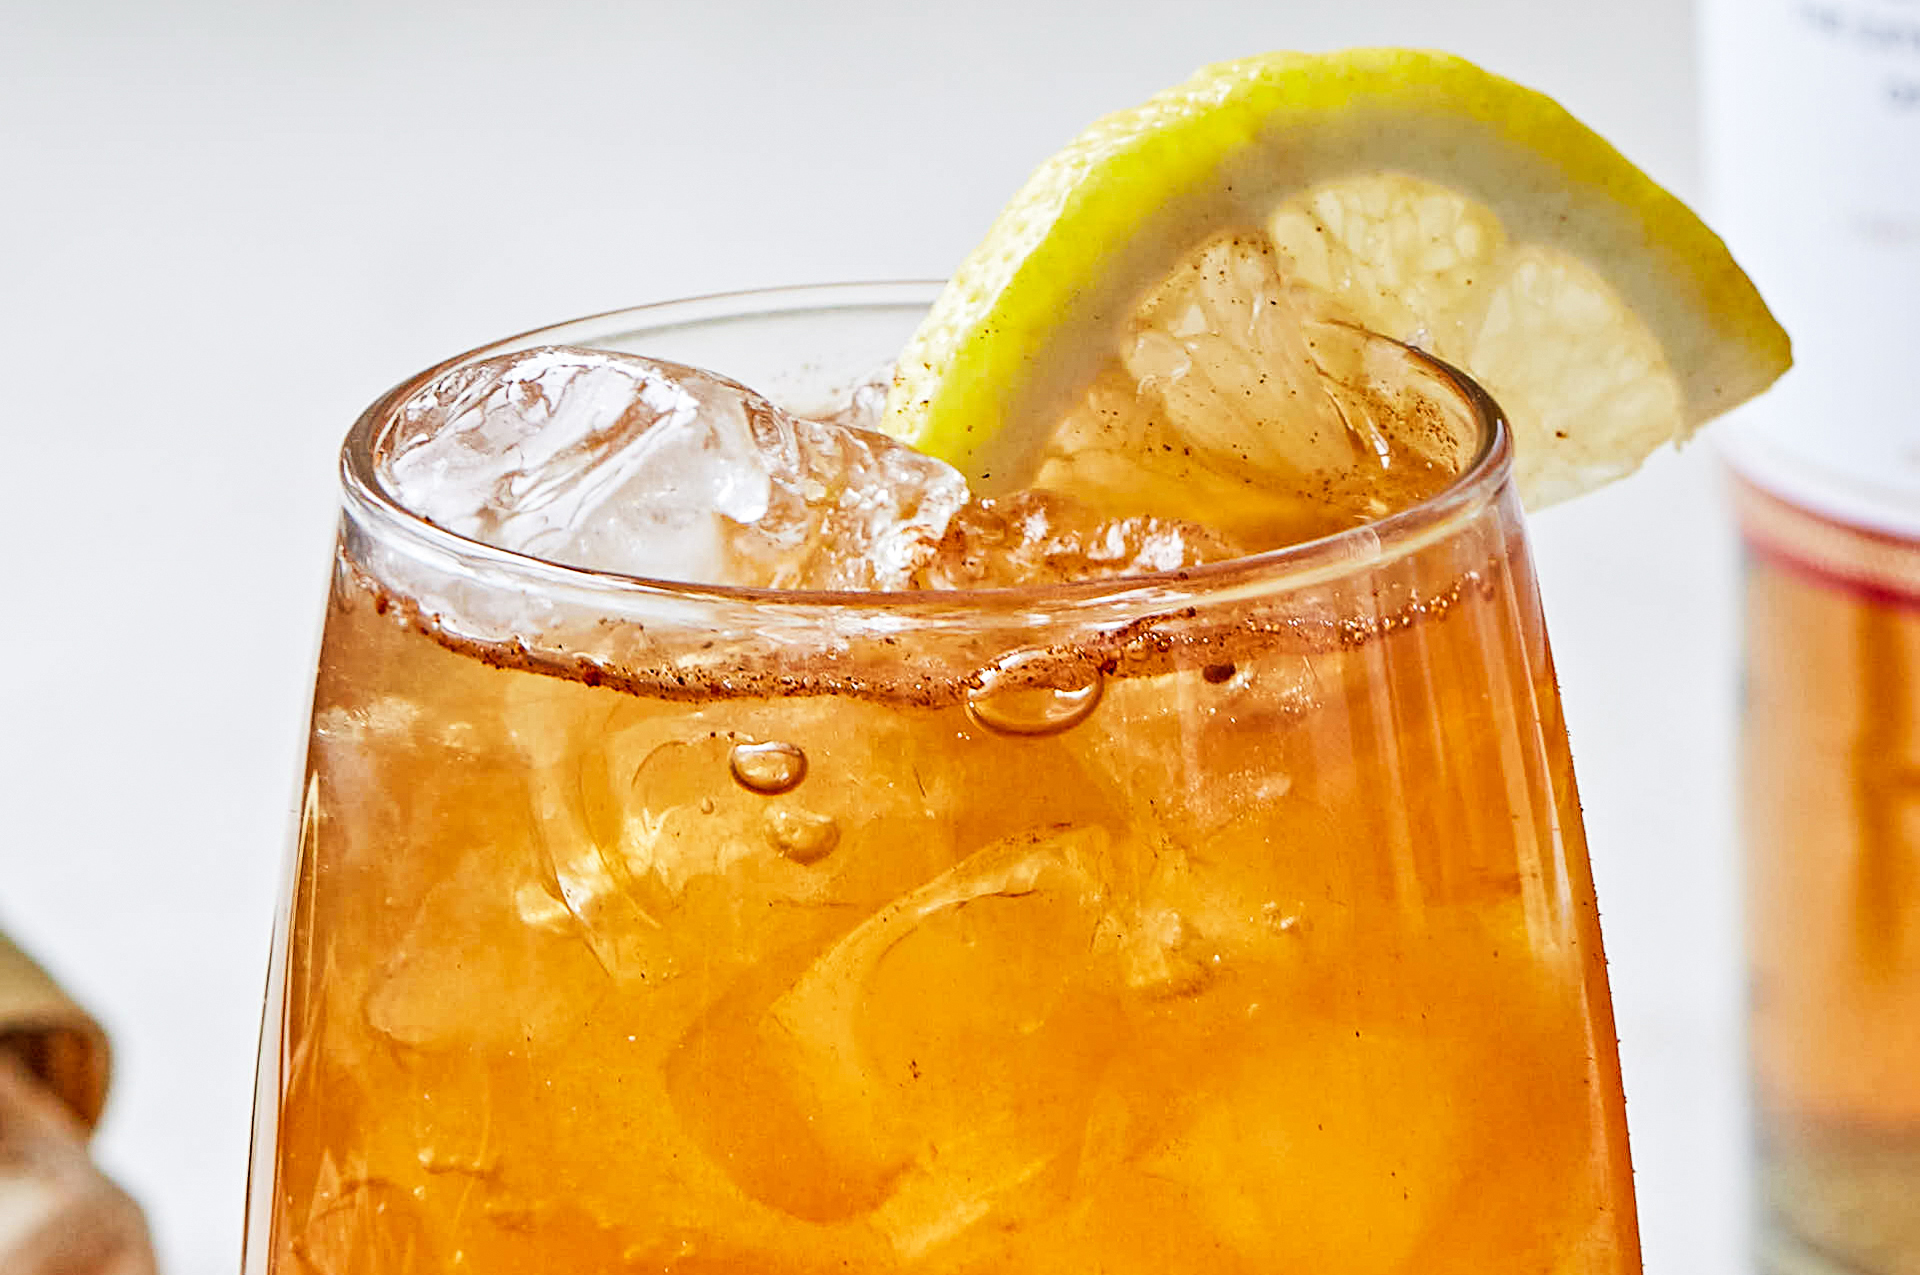 drink-stack-e3.jpg